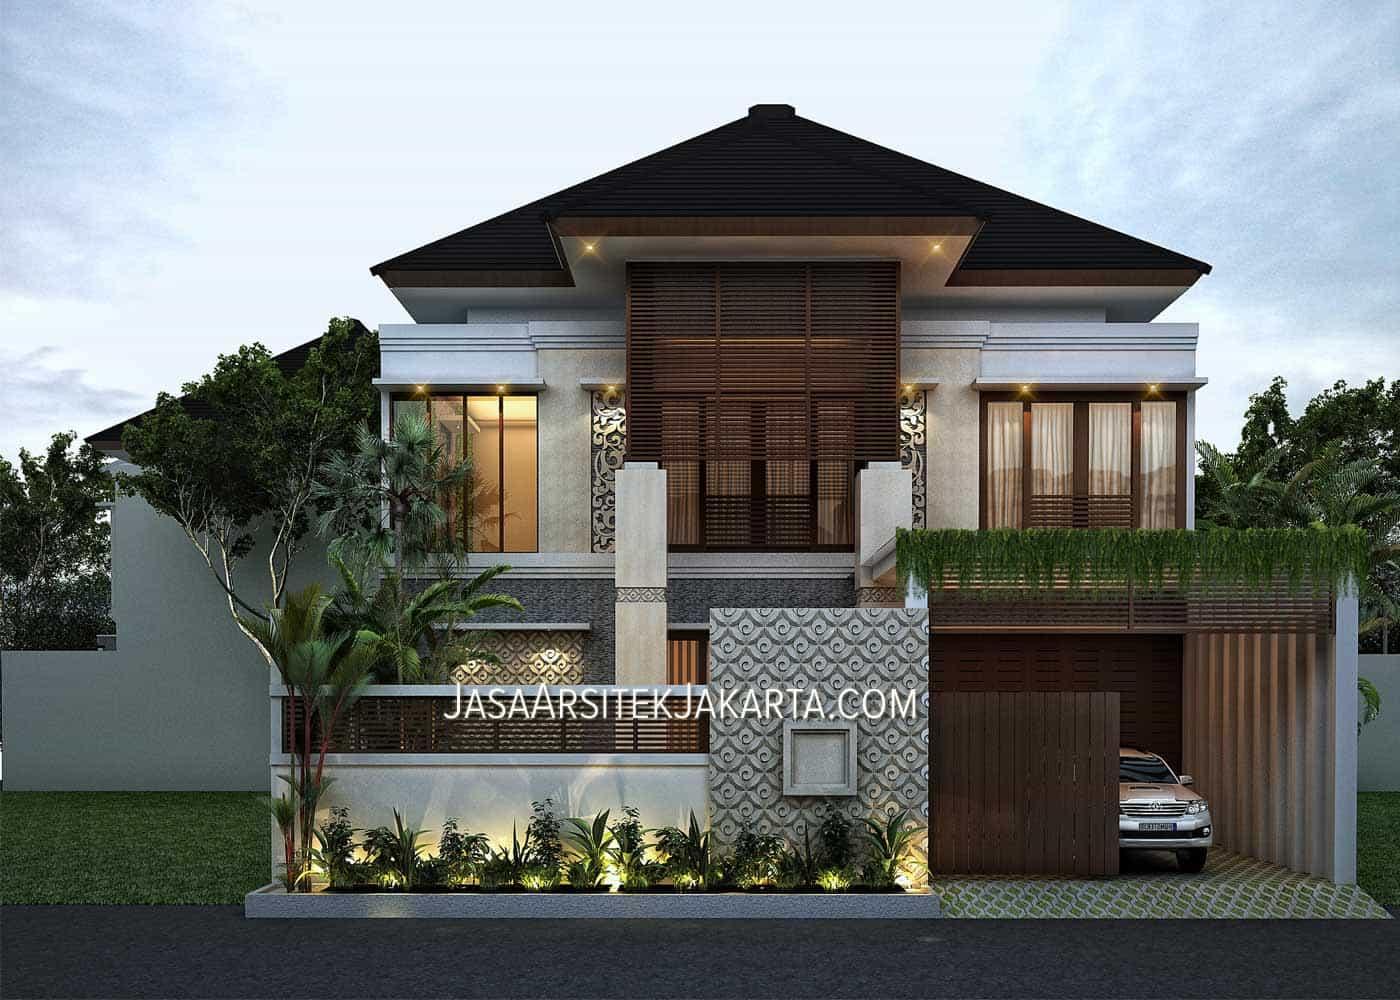 Desain Rumah Mewah Luas 900m2 Milik Bu Hasan Jakarta Jasa Arsitek